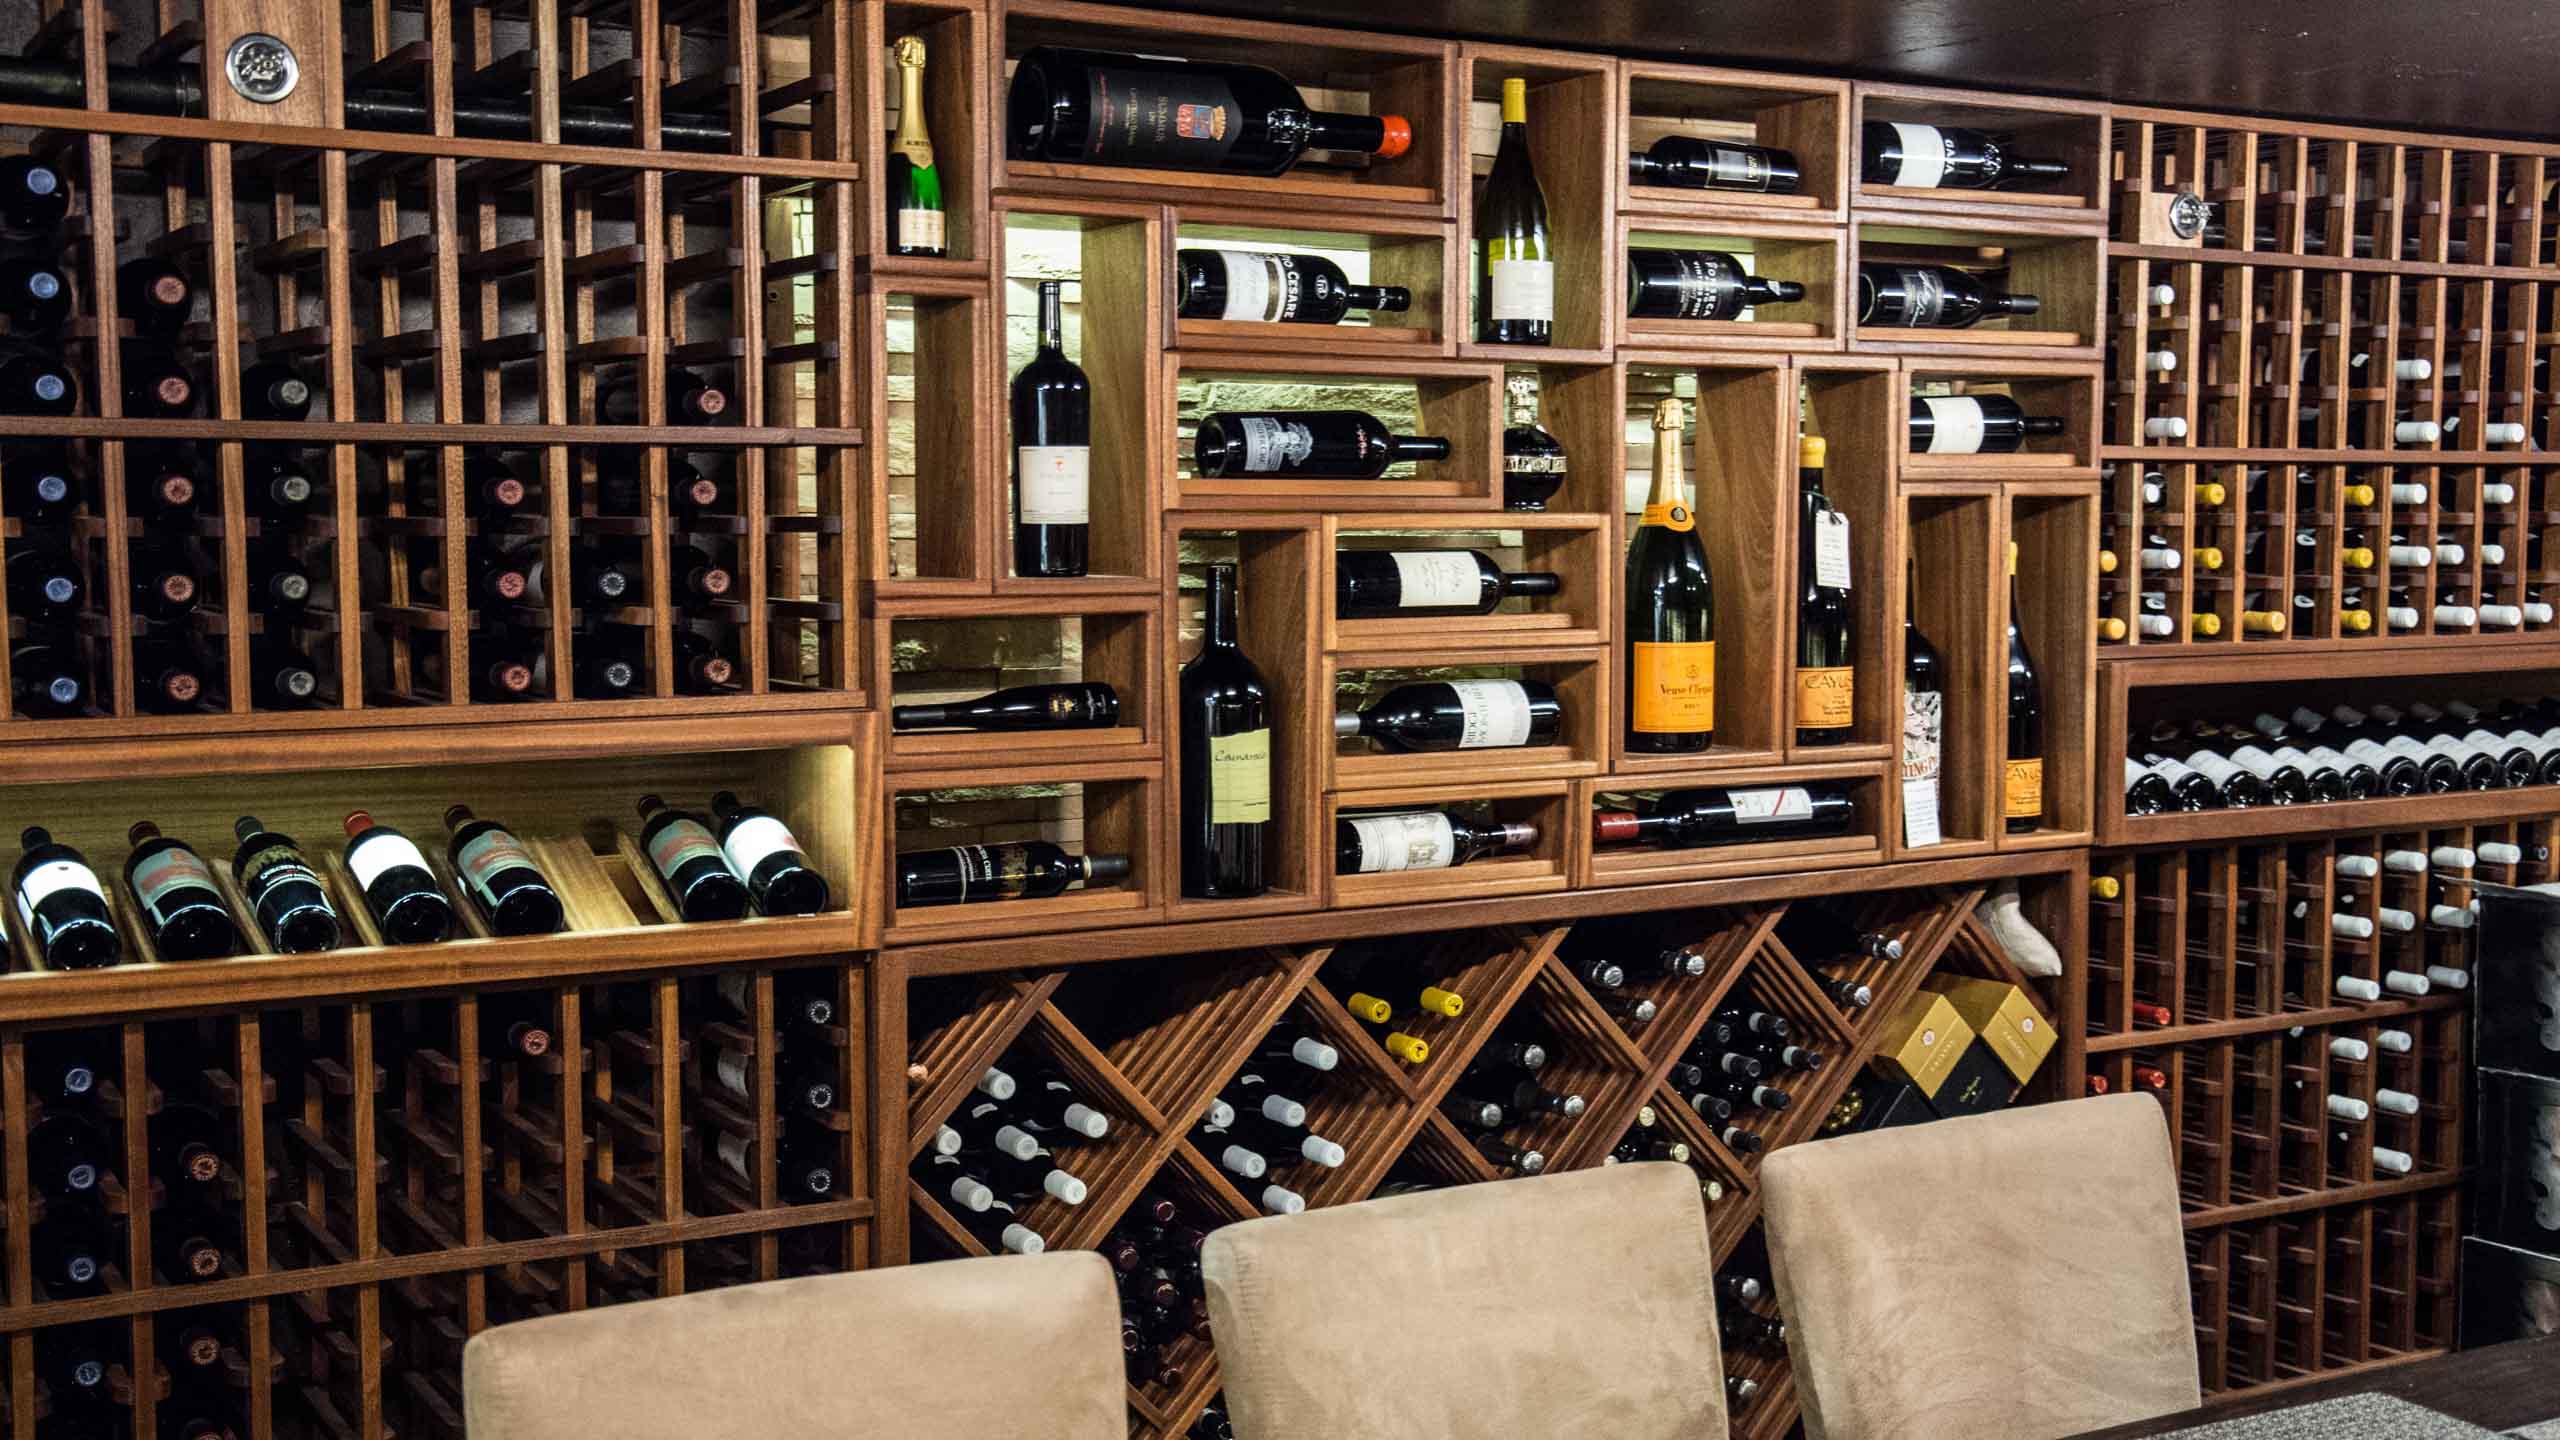 Lake Grove Cellar Z wine cellar